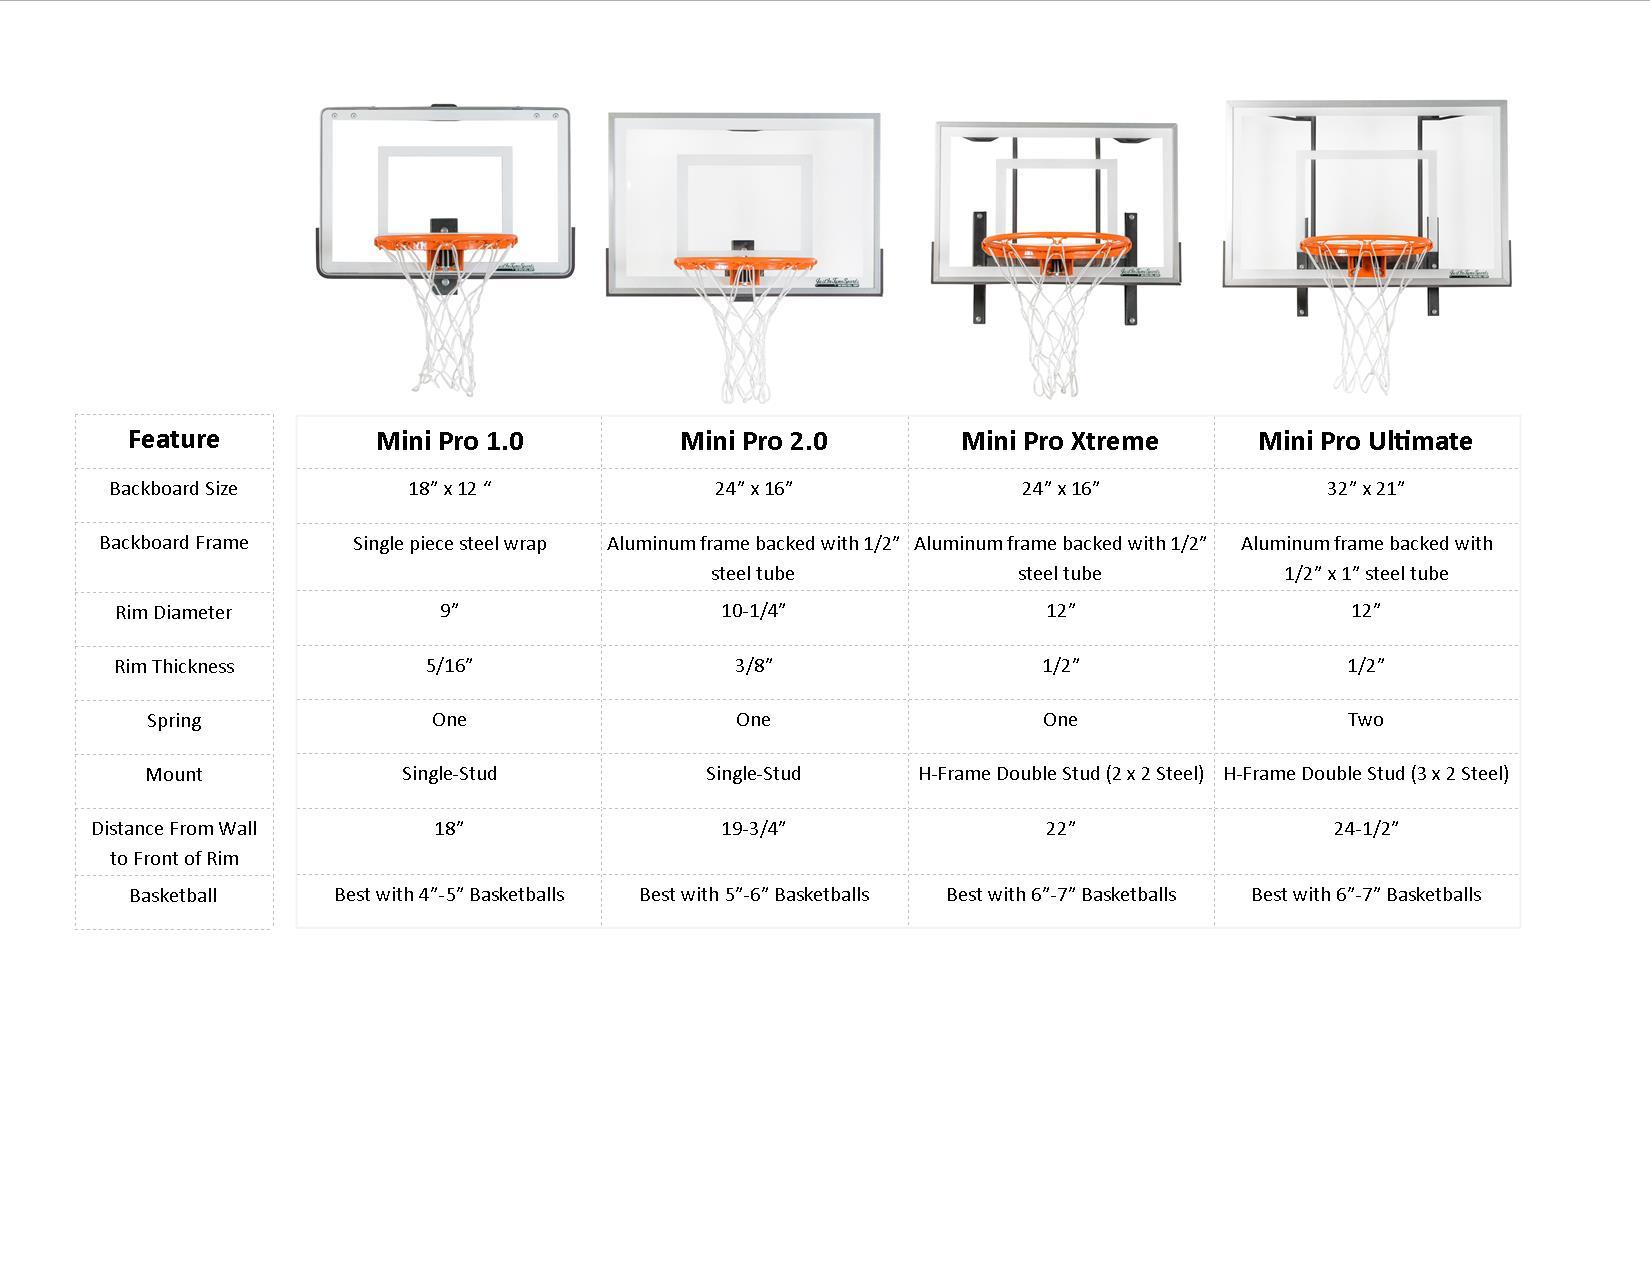 minibasketballhoopcomparisonchart.jpg